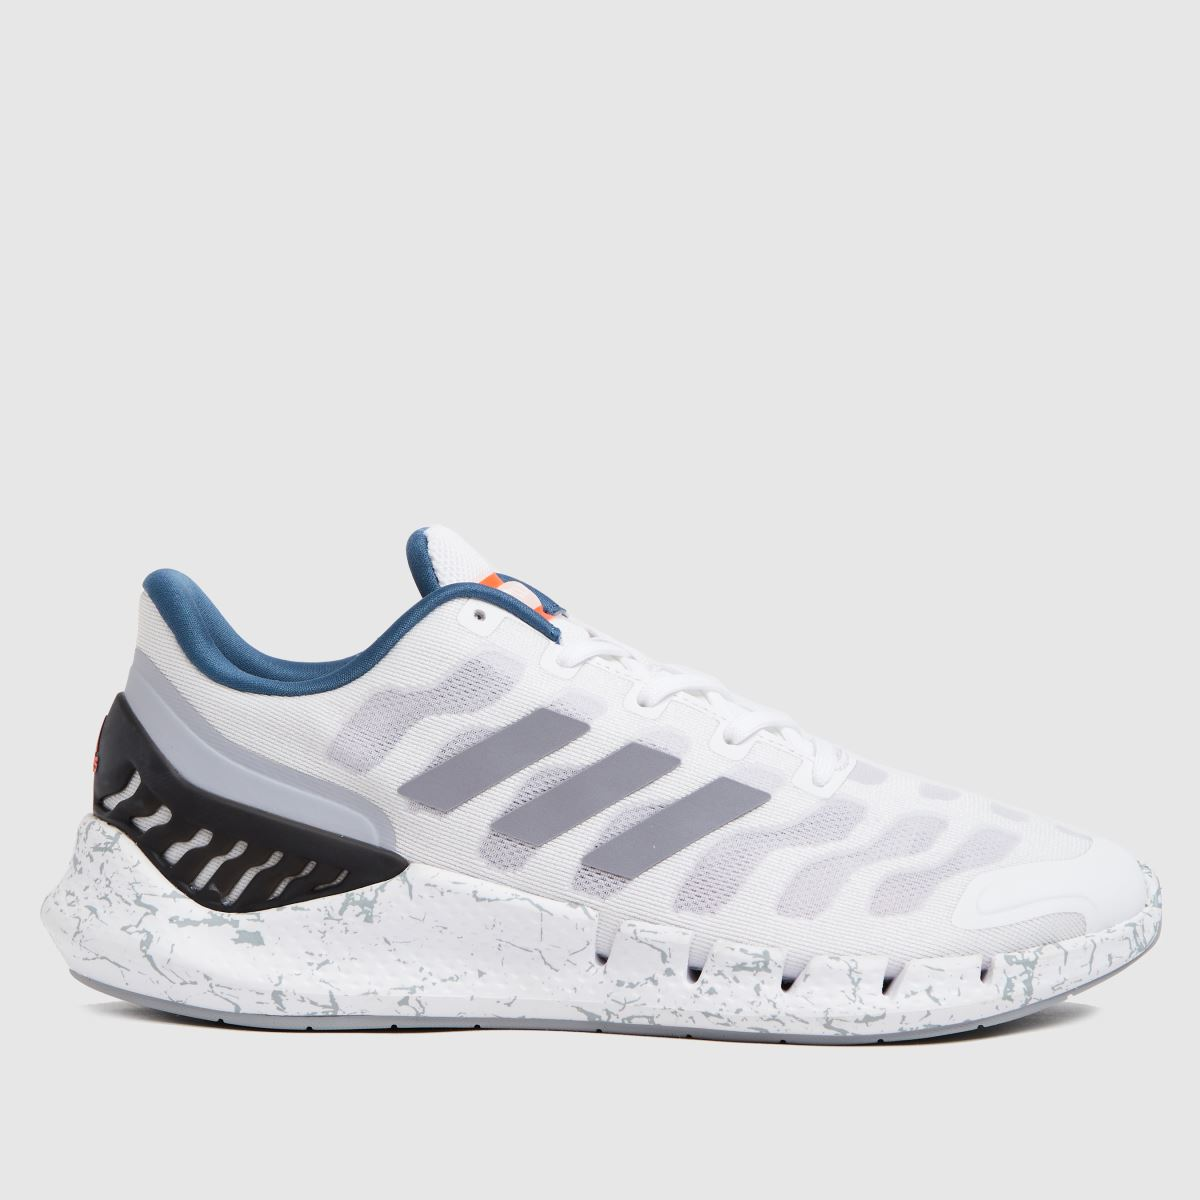 Adidas White & Grey Climacool Ventania Trainers